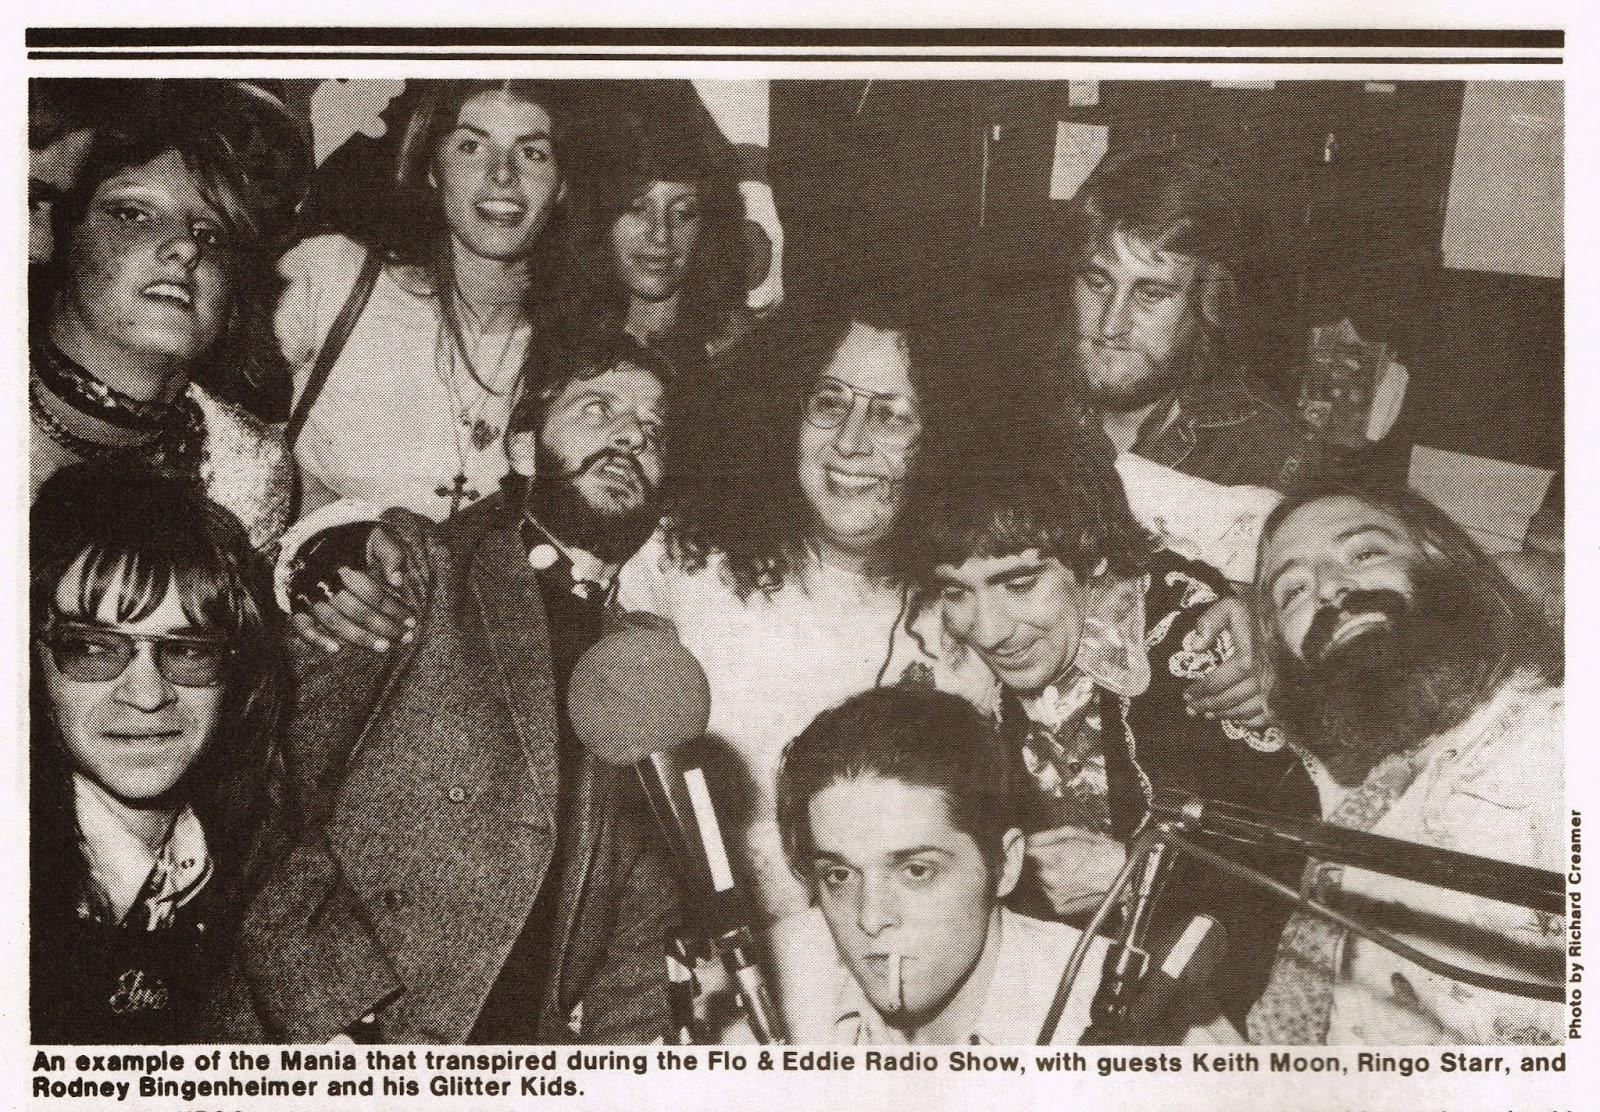 Keith Moon, Ringo Starr and Rodney Bingenheimer